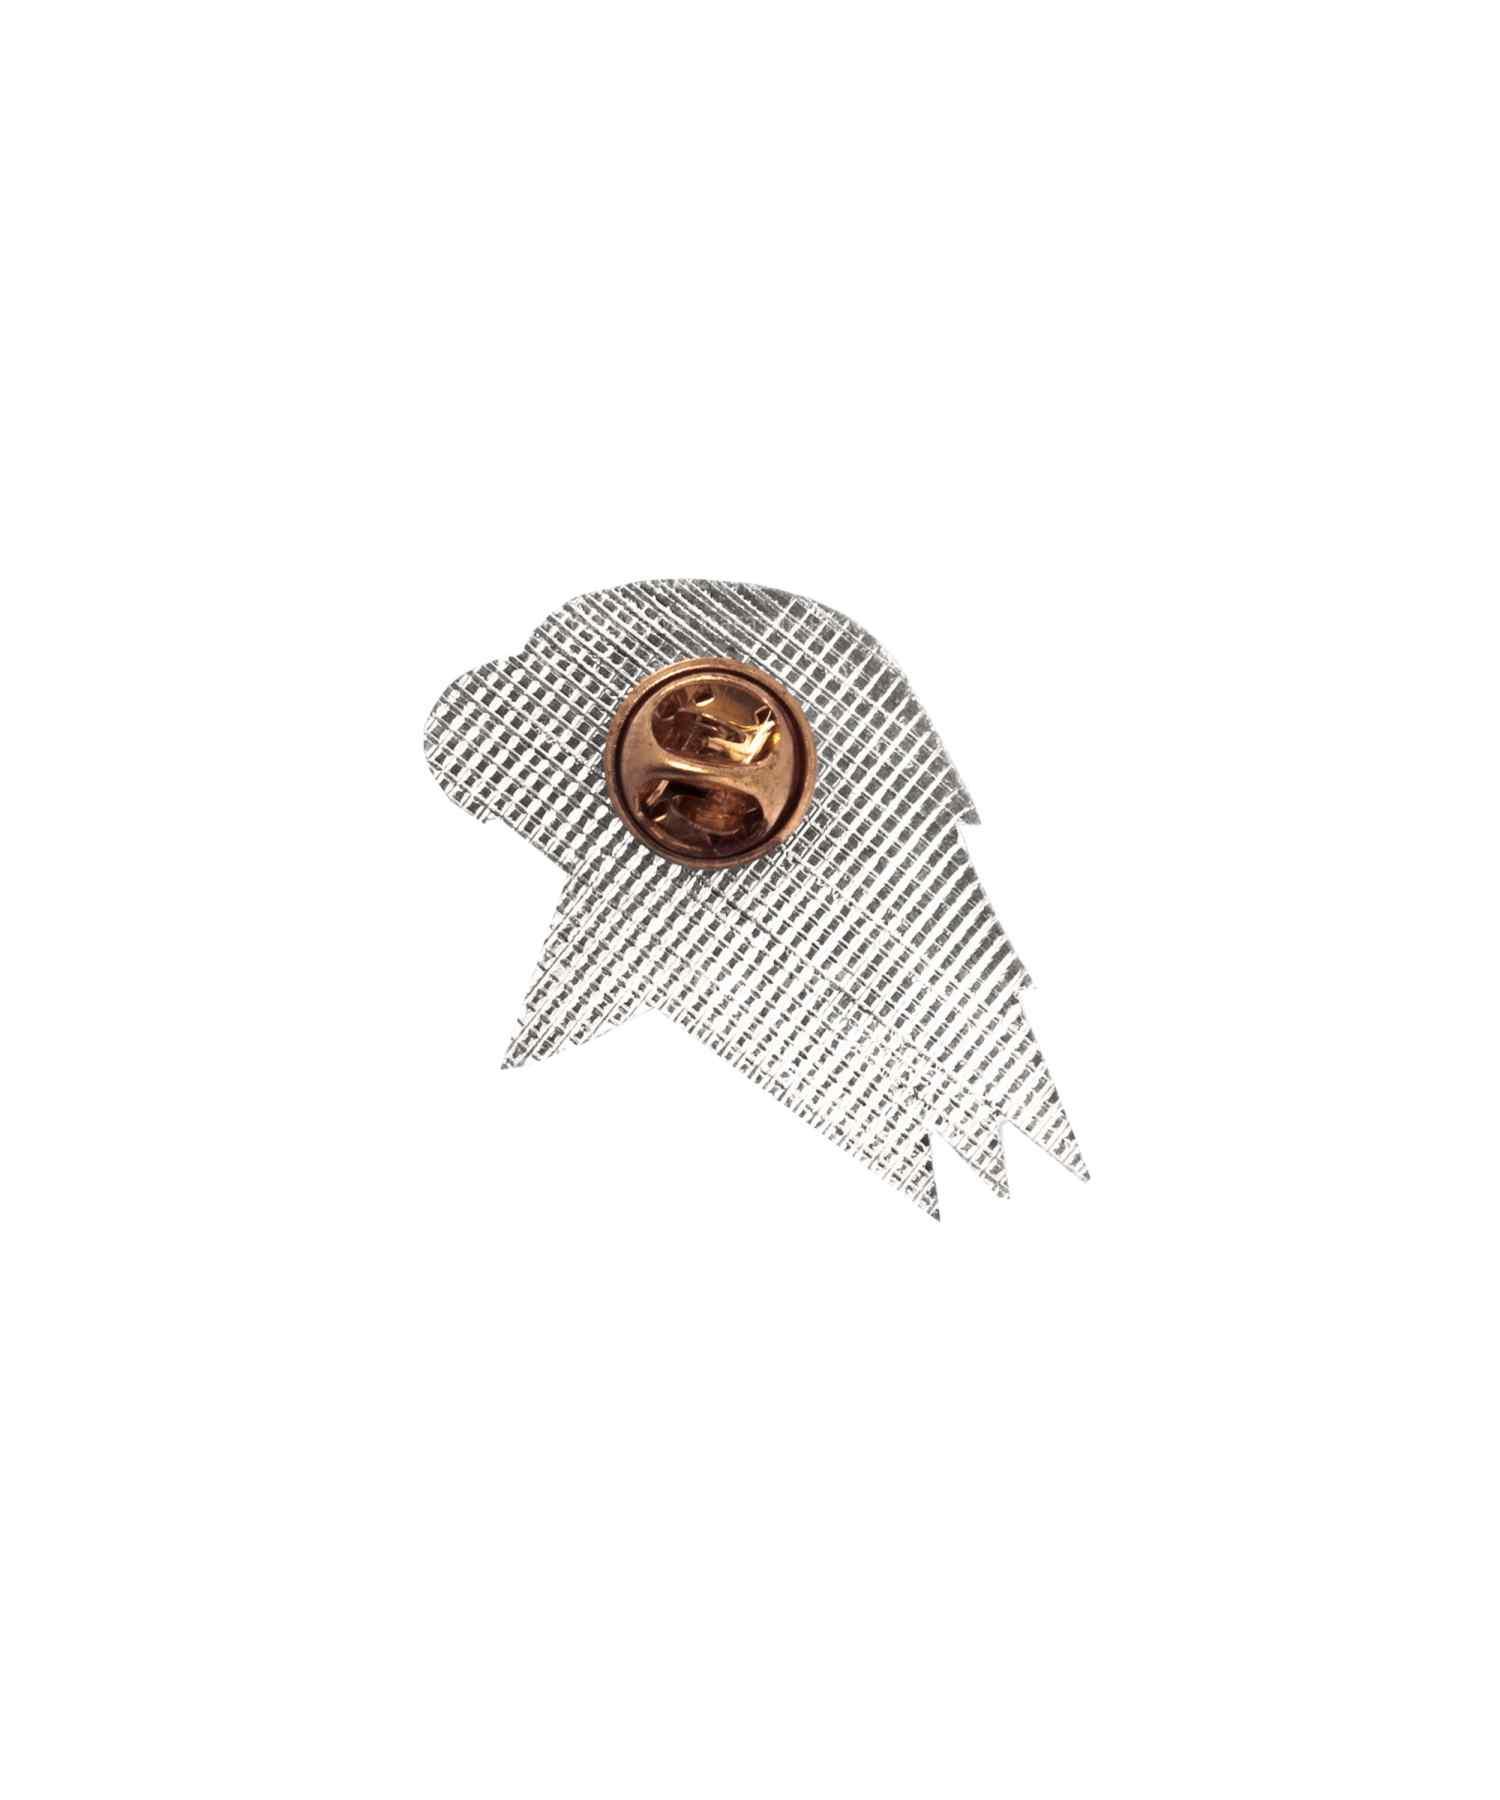 Значок металлический Юнармия на пимсе 25мм